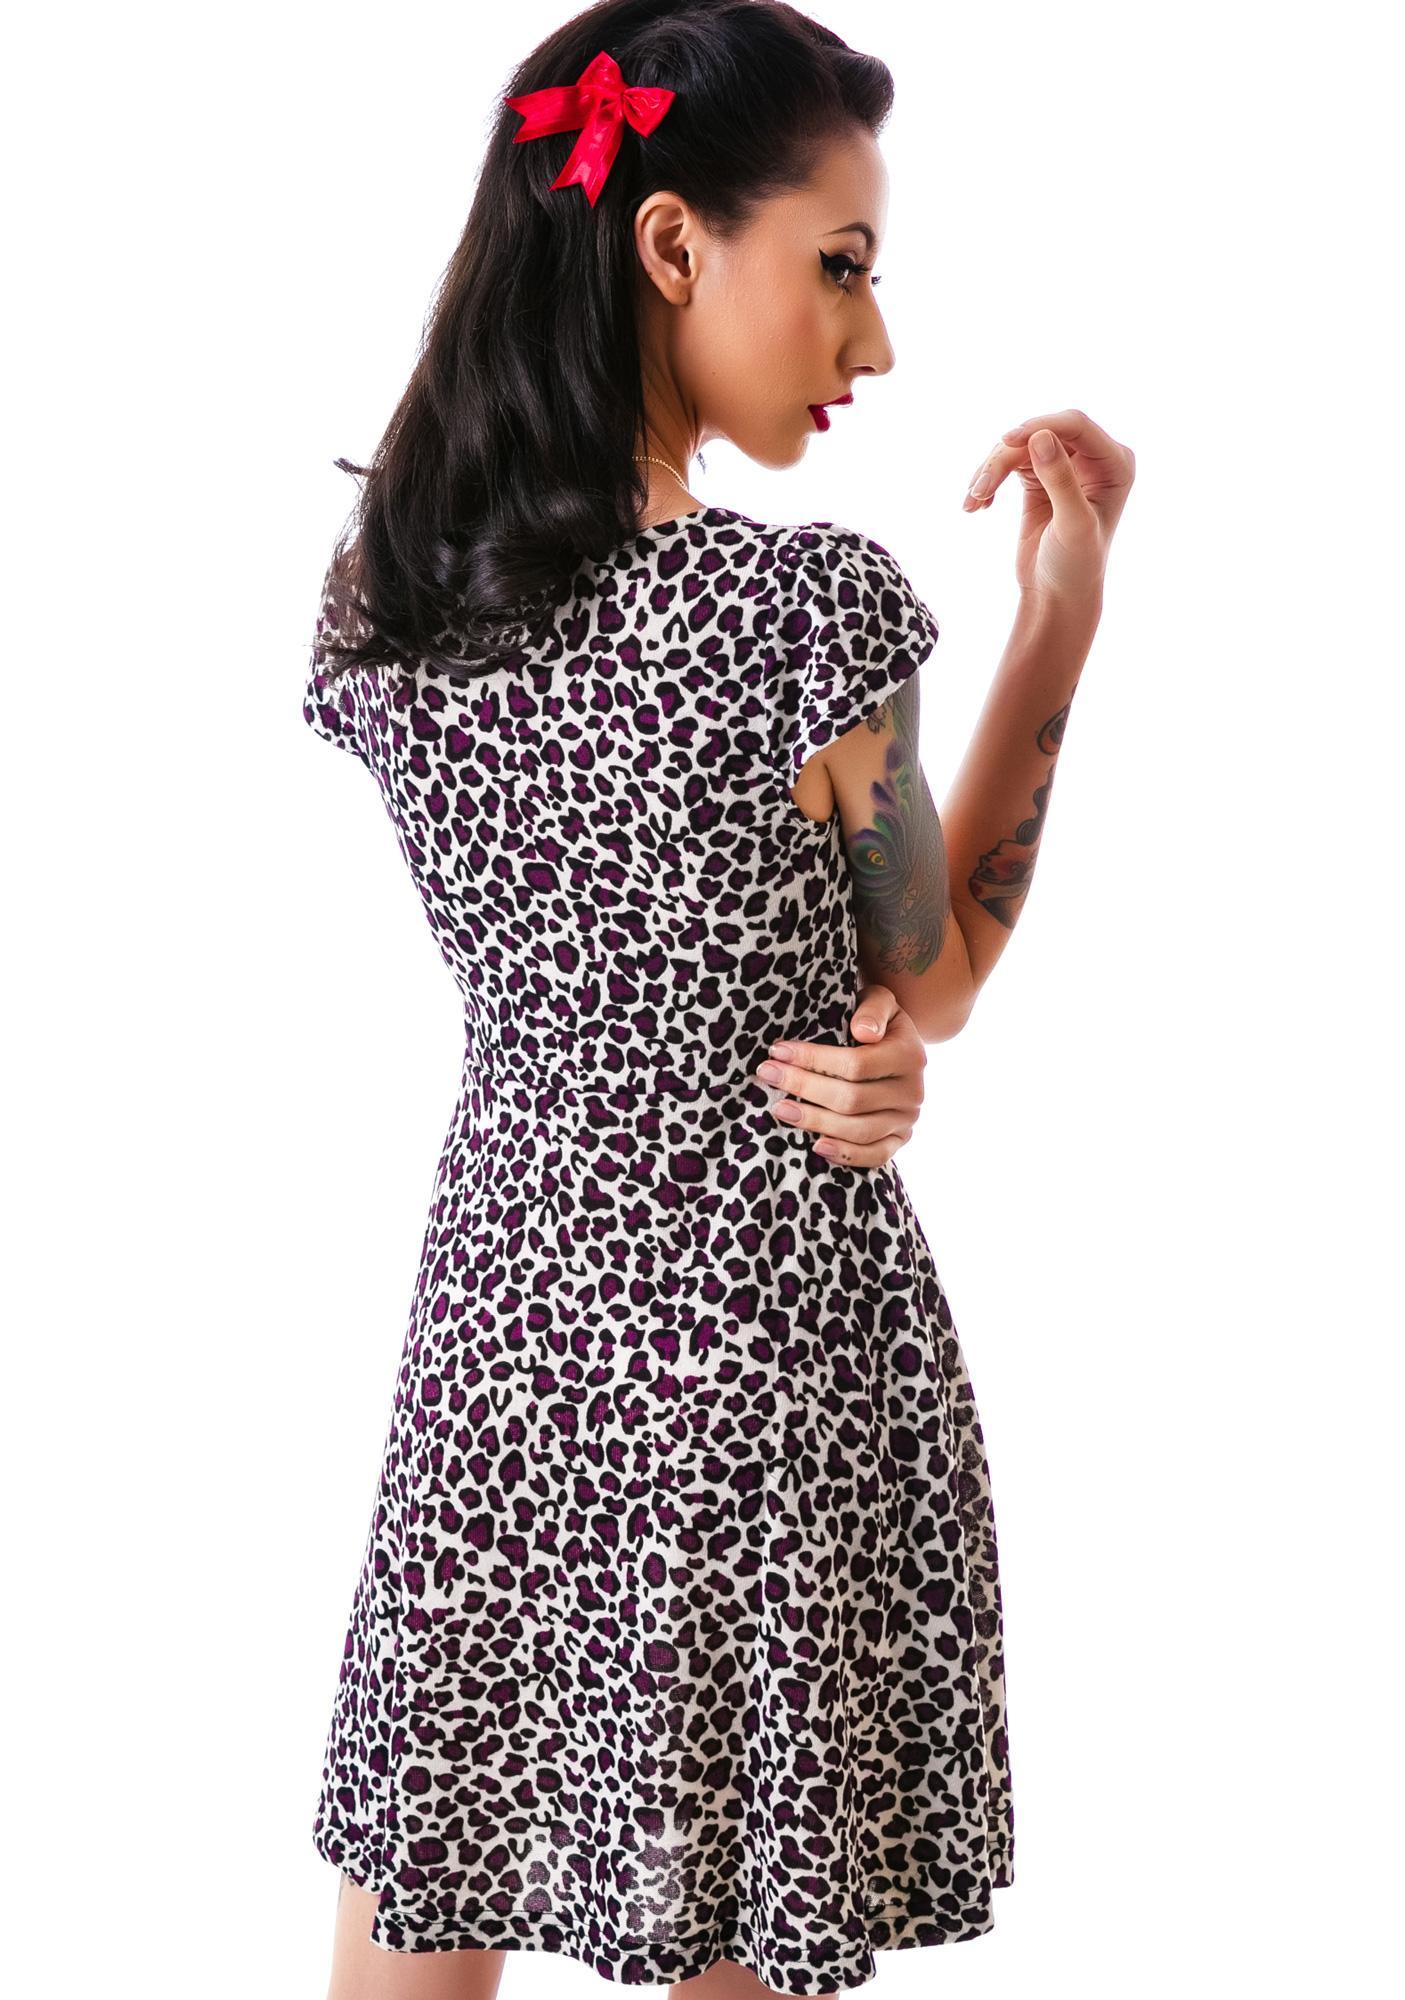 Sourpuss Clothing Vavavoom Leopard Dress